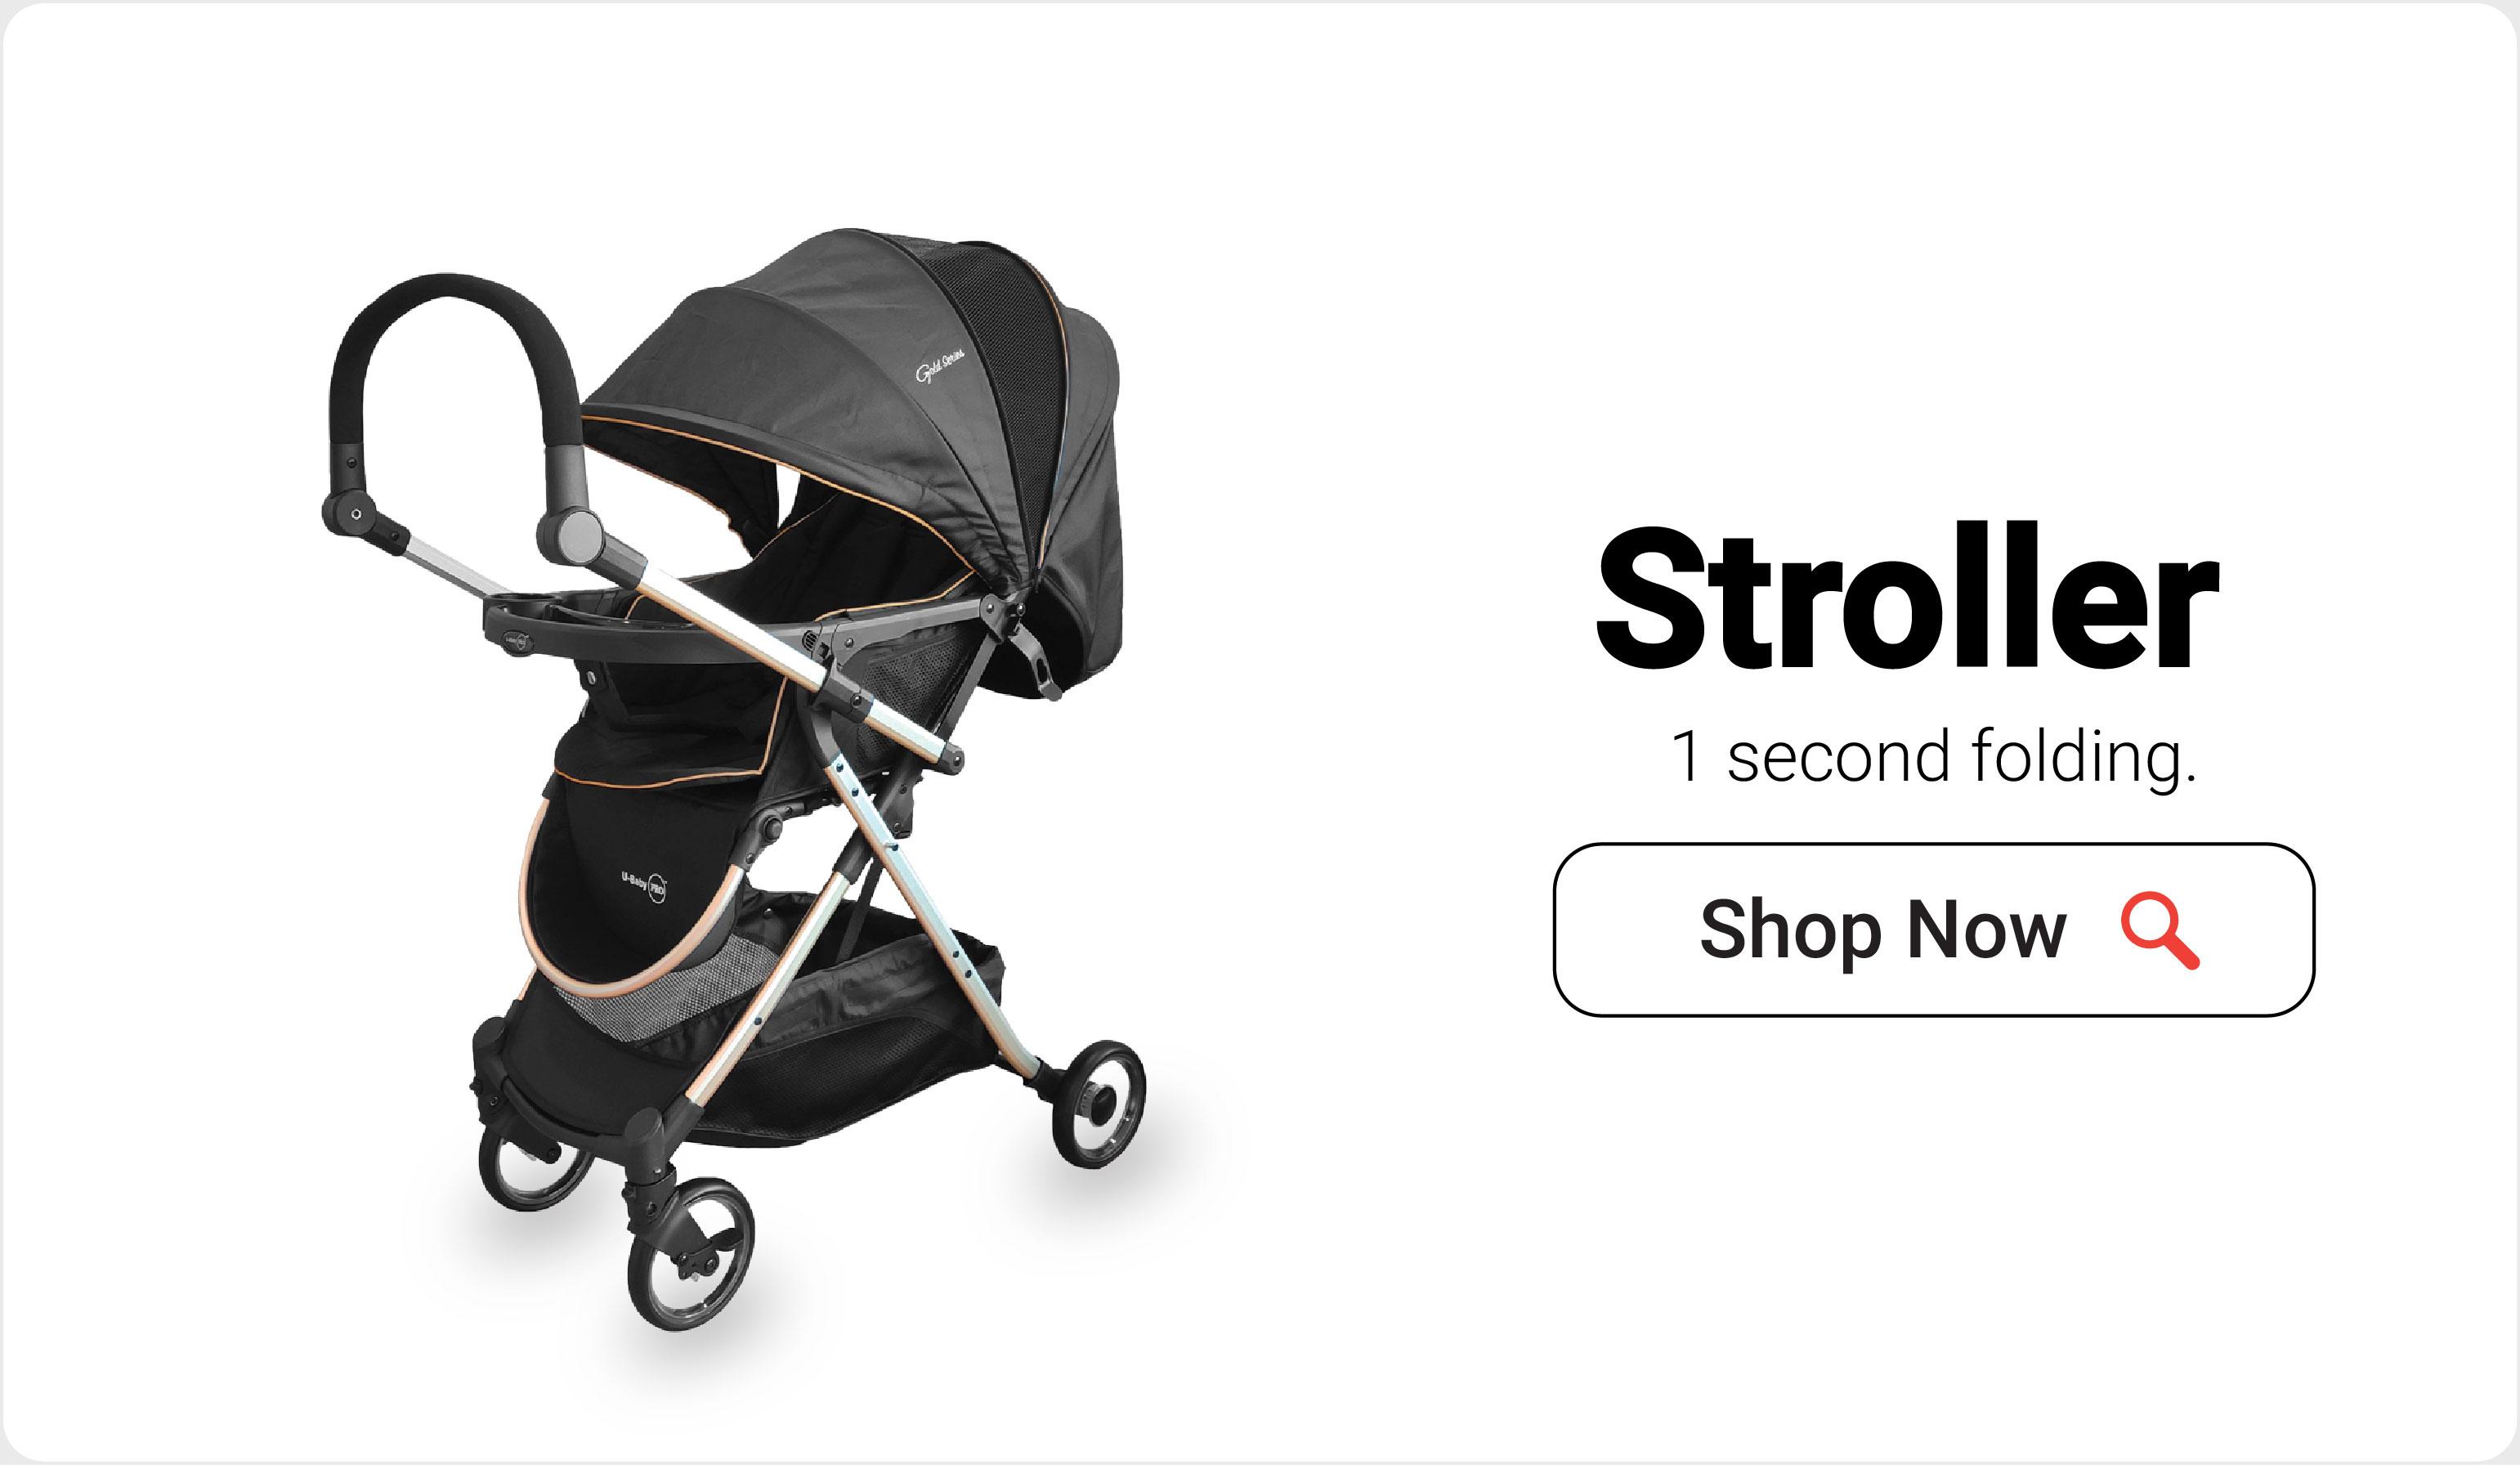 Category - Stroller